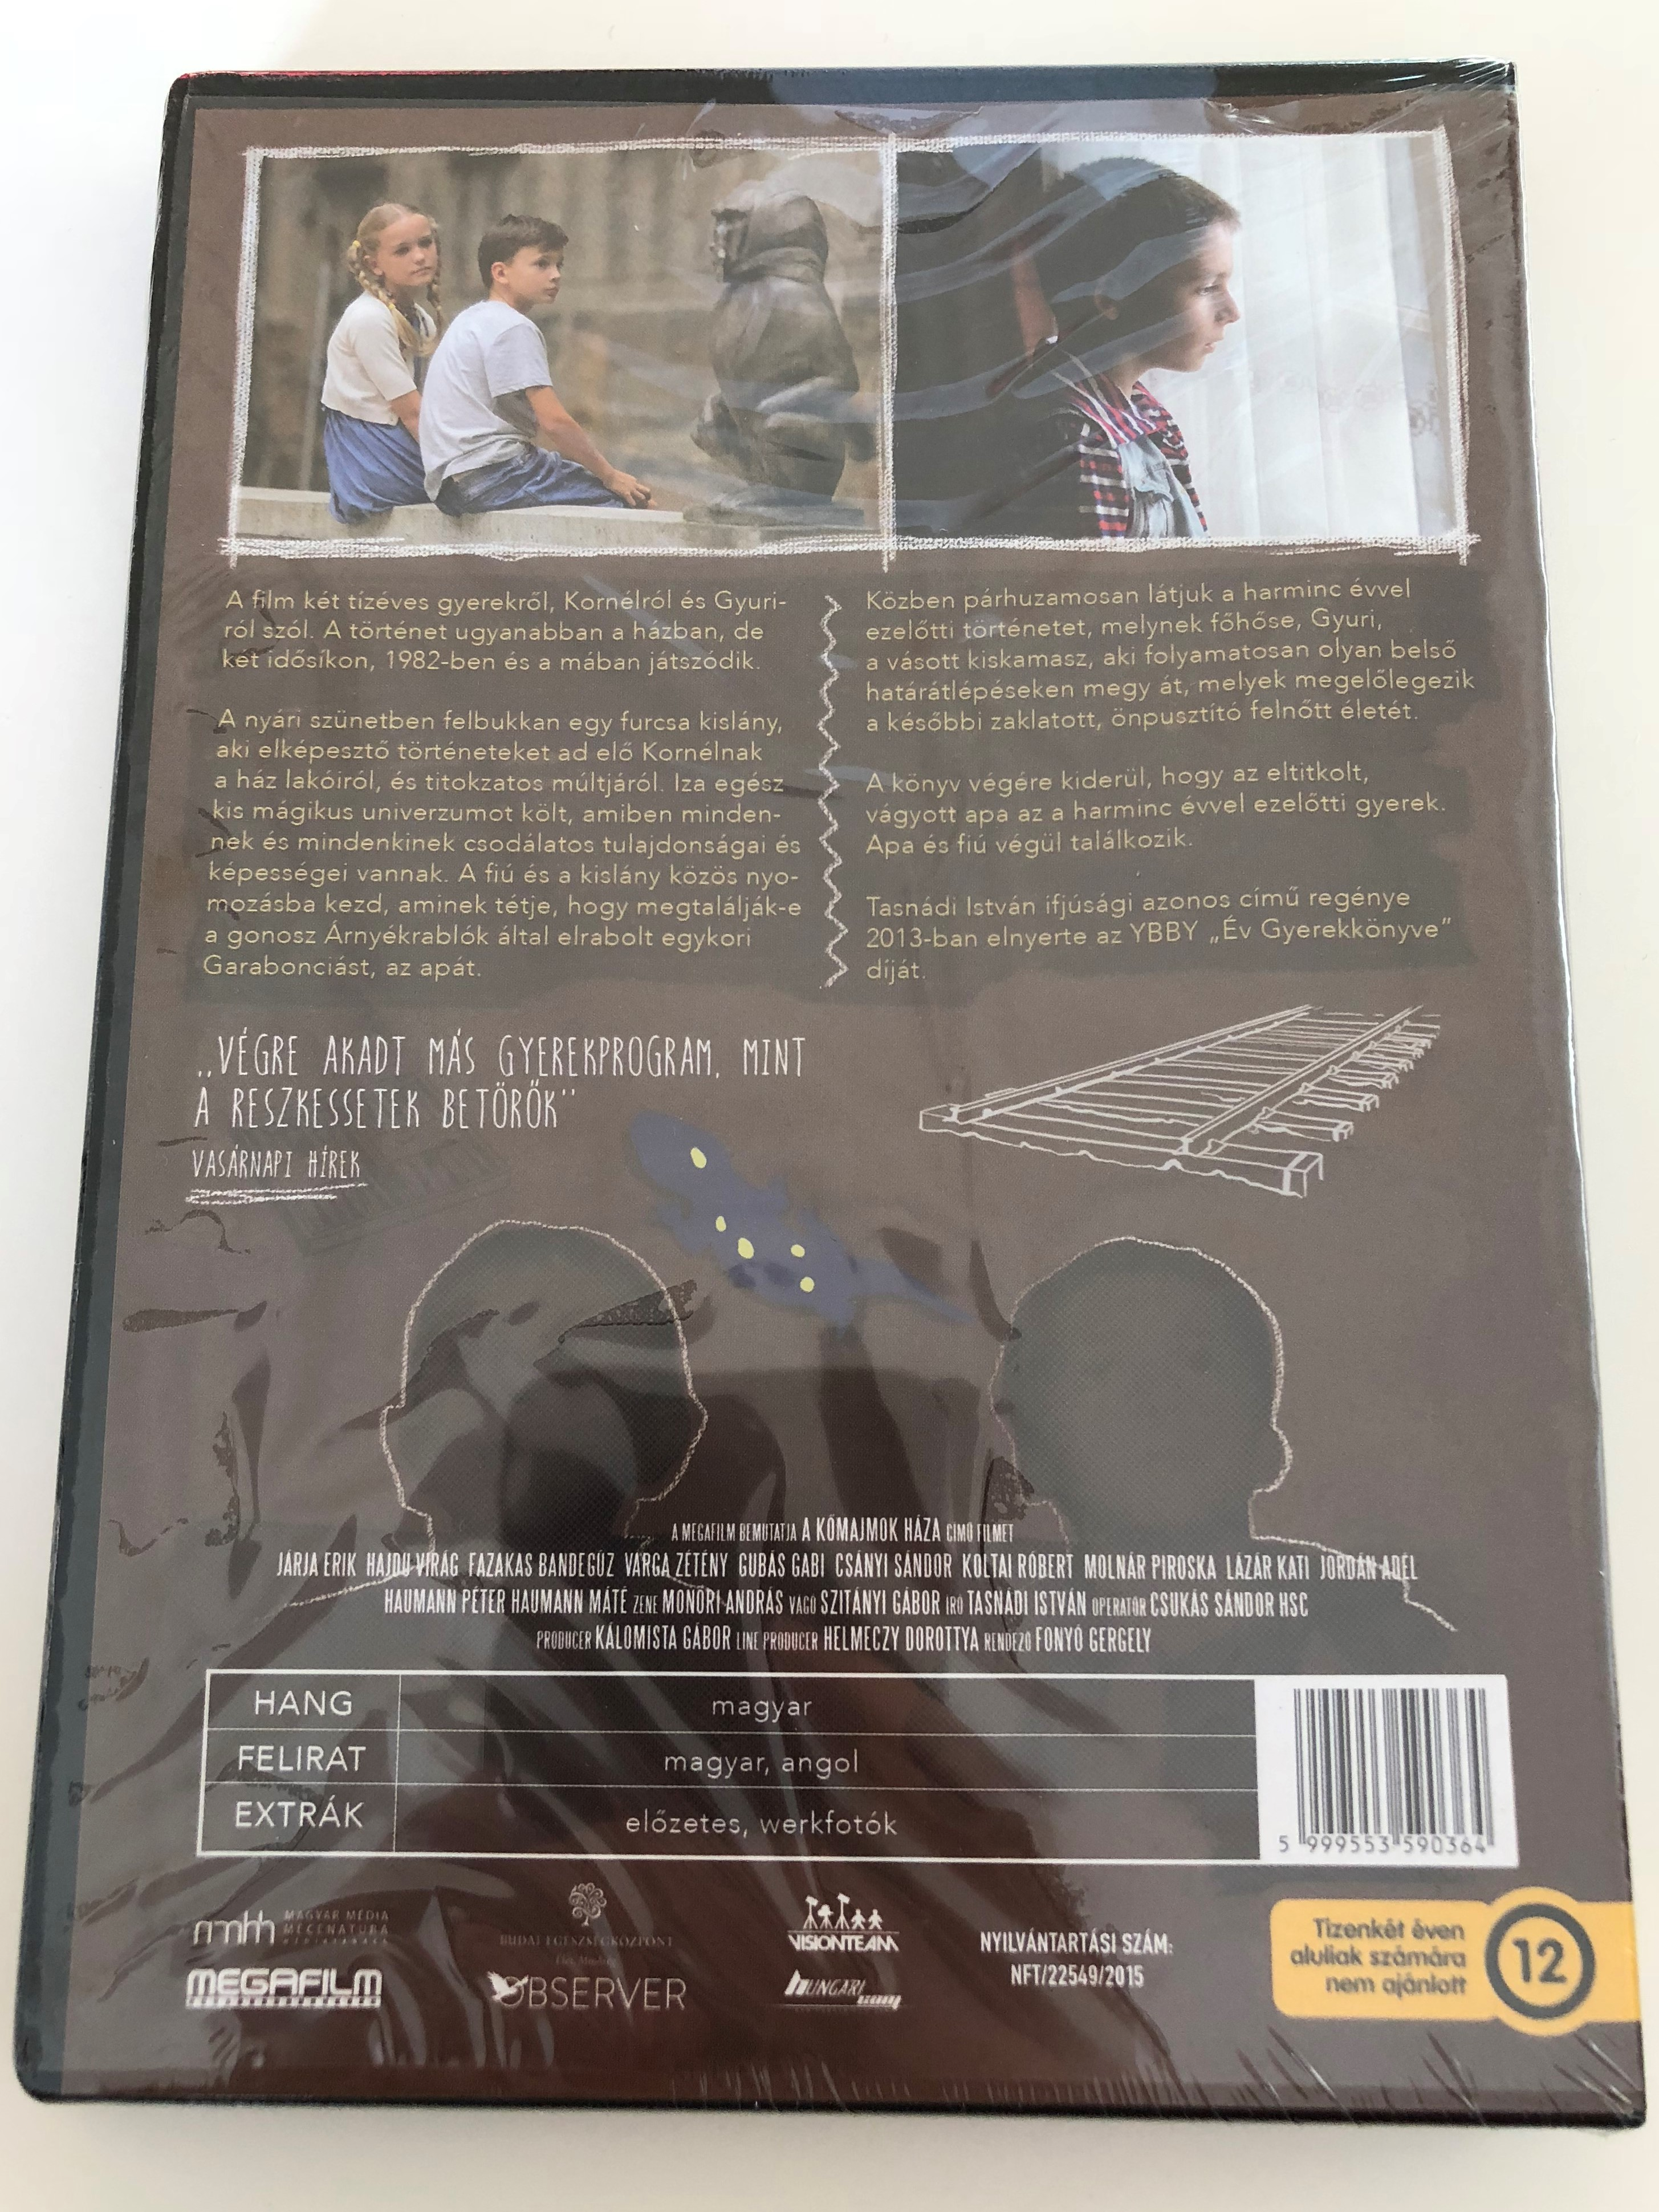 k-majmok-h-za-dvd-2014-house-of-the-stone-monkeys-directed-by-fony-gergely-starring-j-rja-erik-hajd-vir-g-gub-s-gabi-cs-nyi-s-ndor-3-.jpg